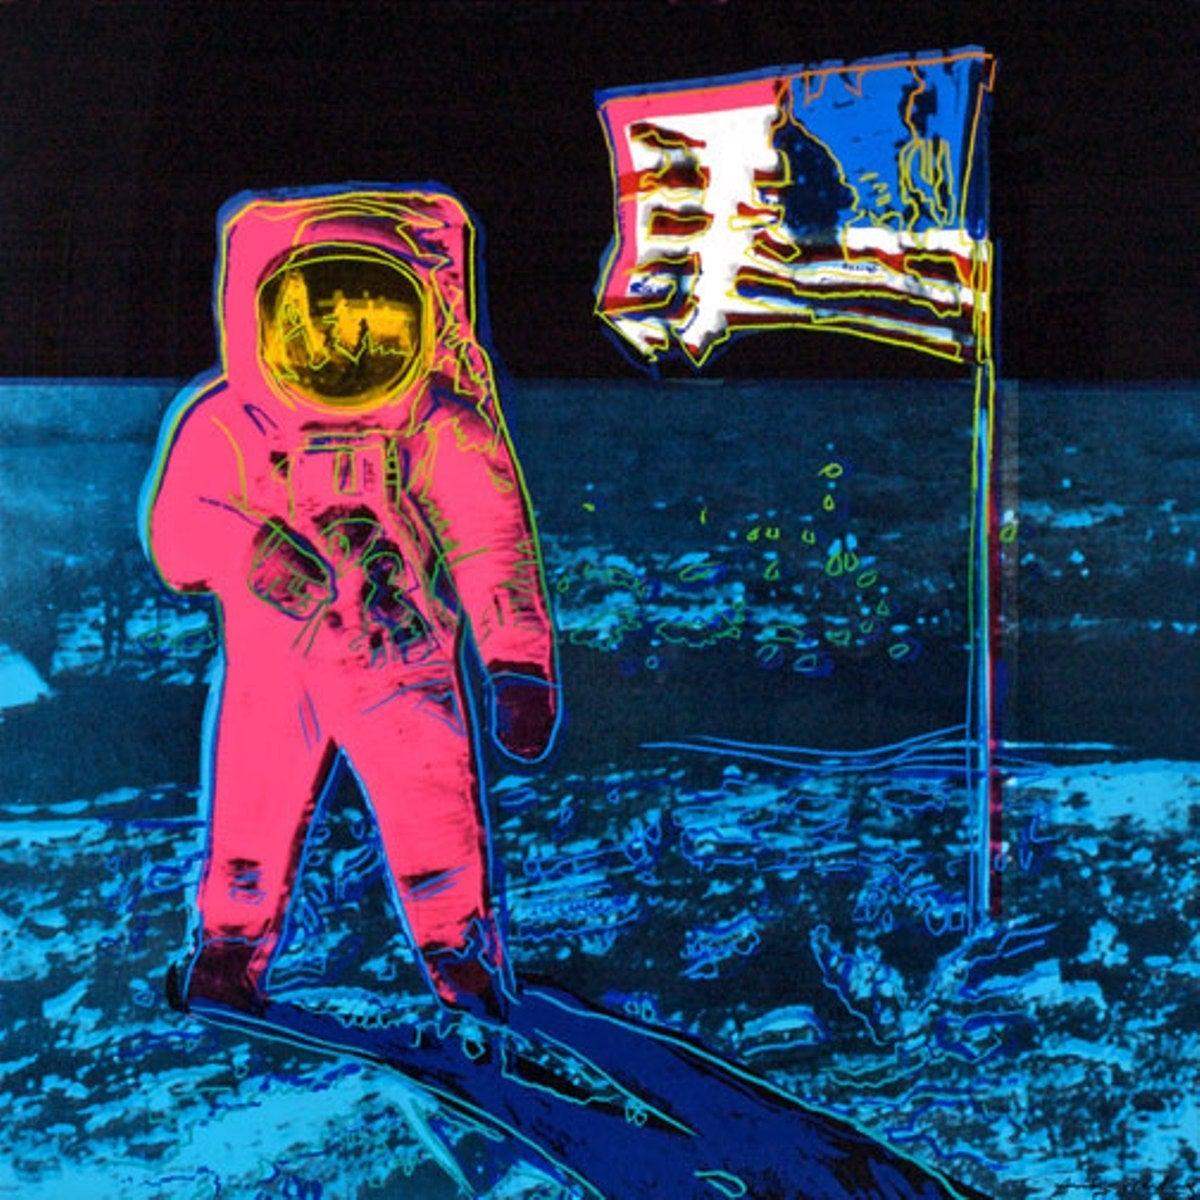 Andy Warhol Moonwalk Pink Ii 405 Print At 1stdibs